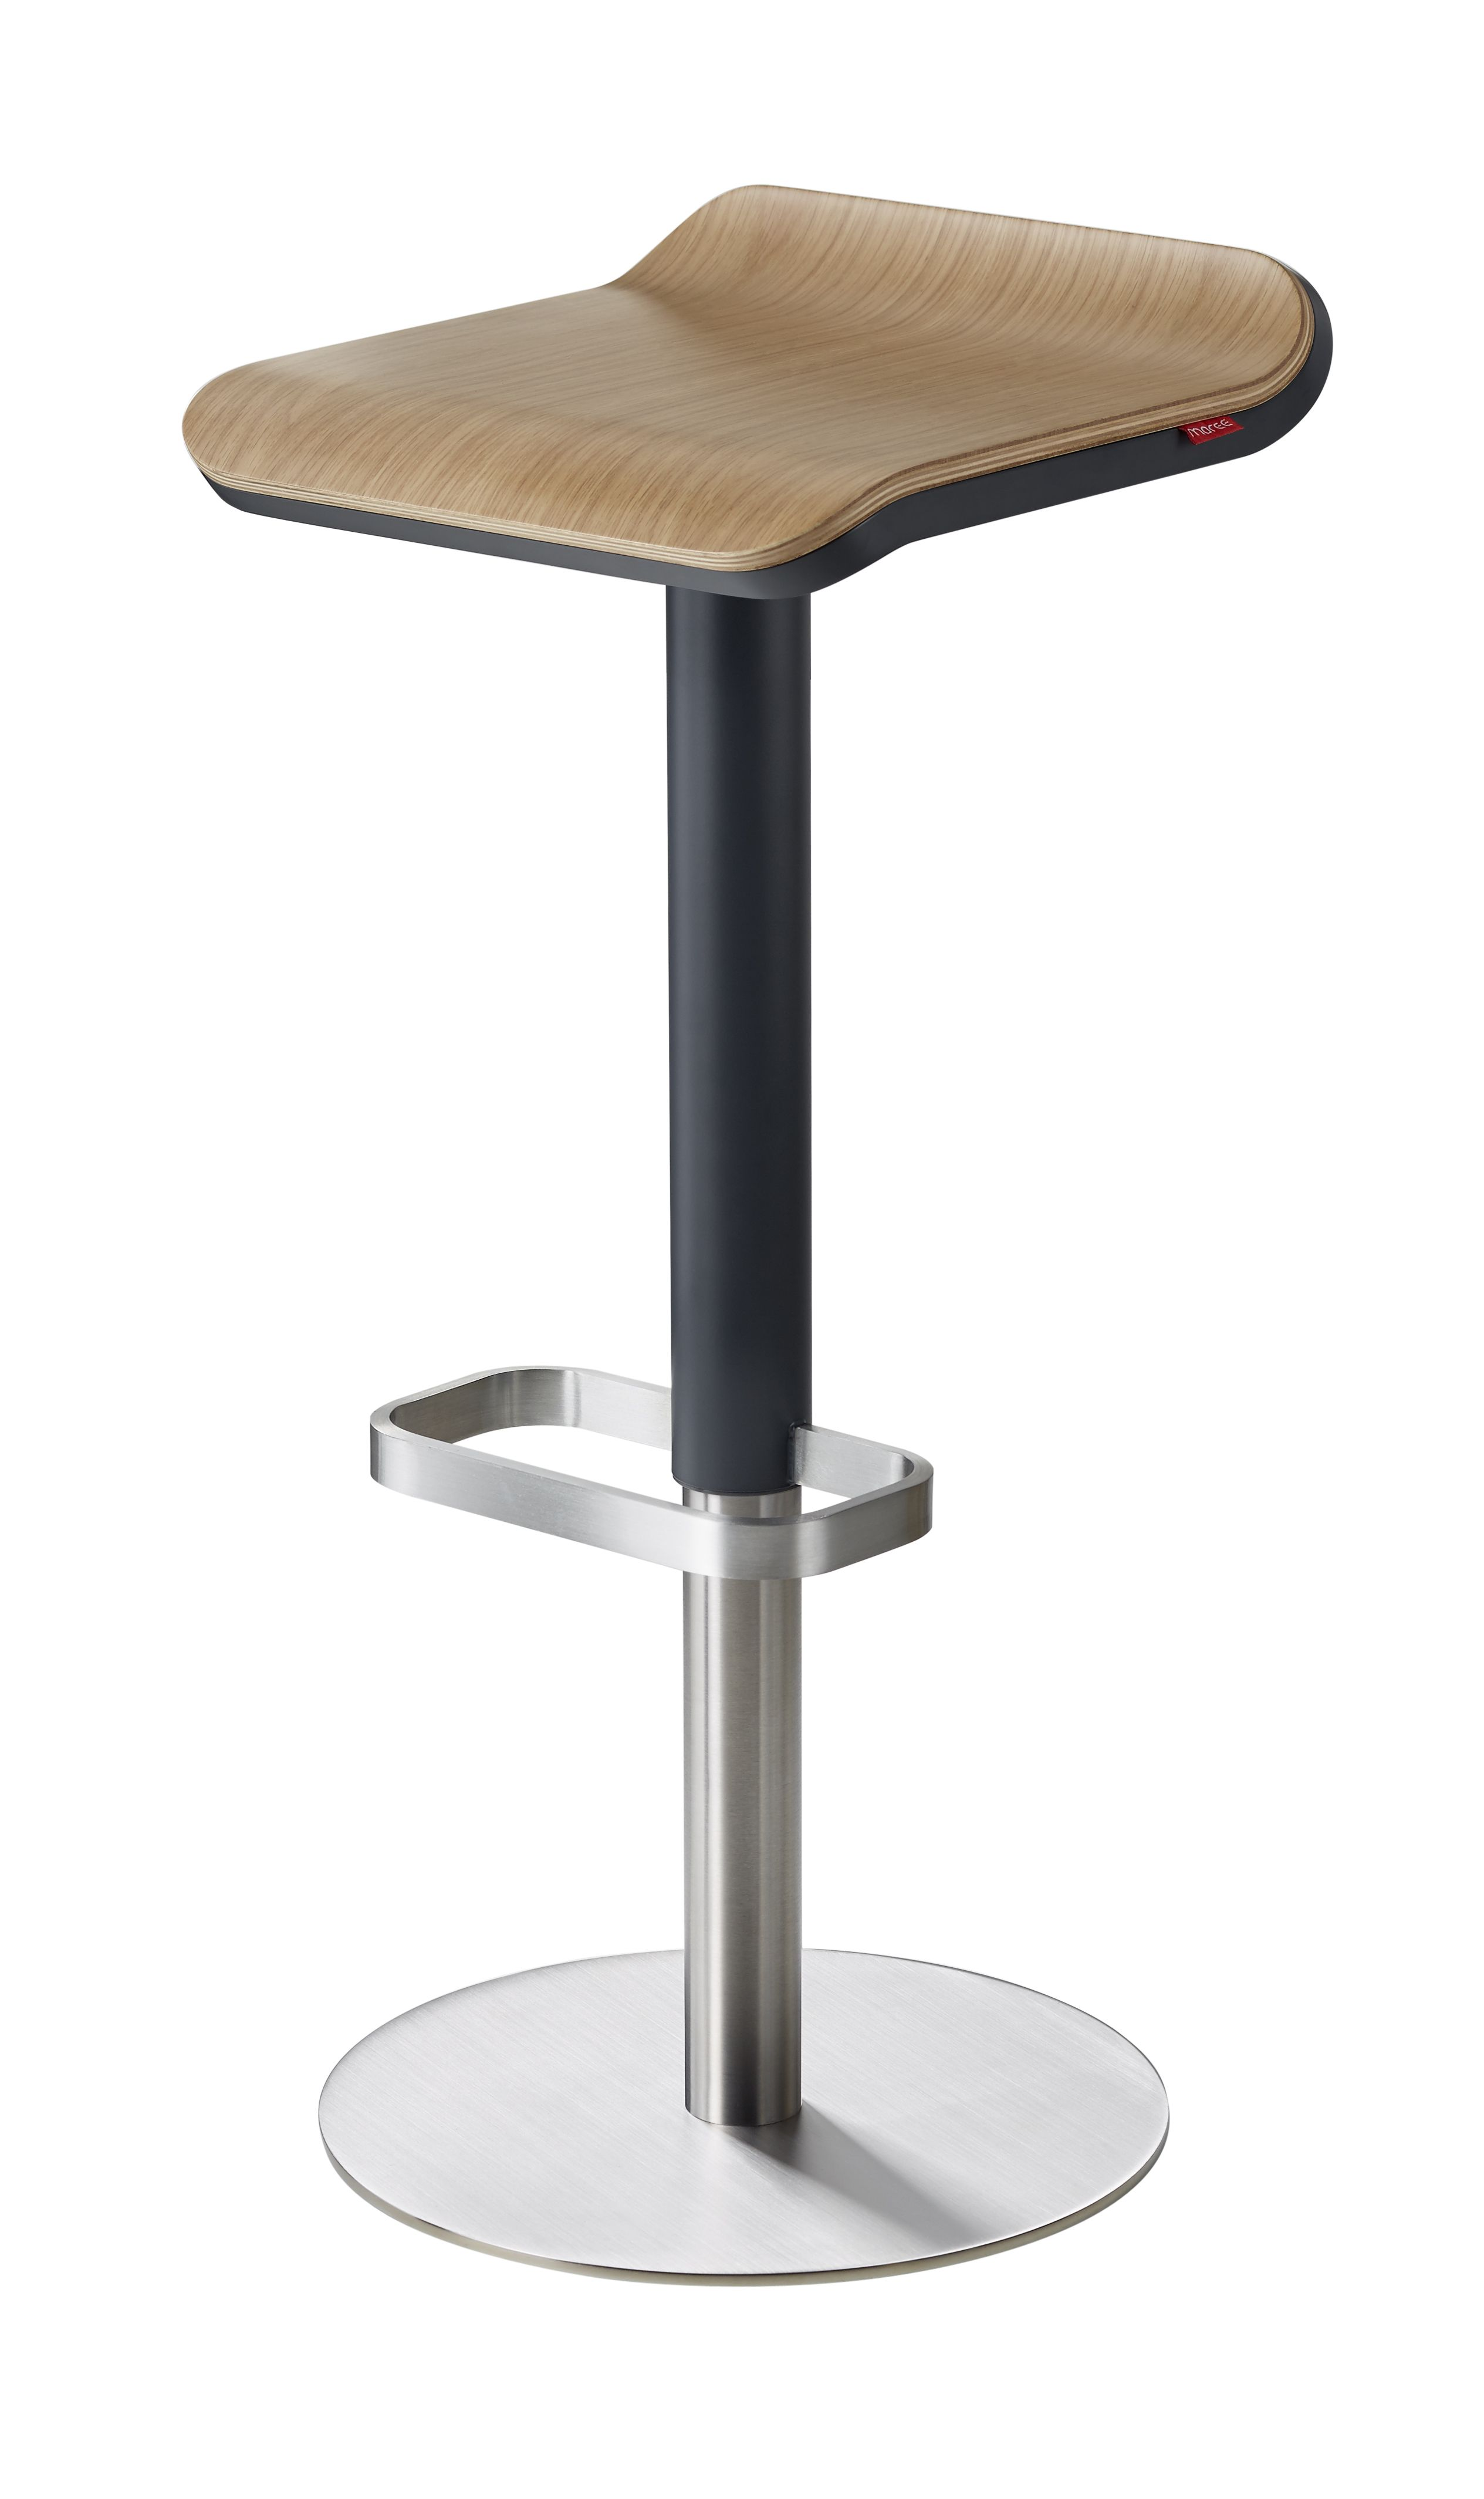 Barhocker Hohenverstellbar Dank Unsichtbarem Gaslifter Ed Von Moree Wooden Bar Stools Bar Stool Furniture Adjustable Bar Stools